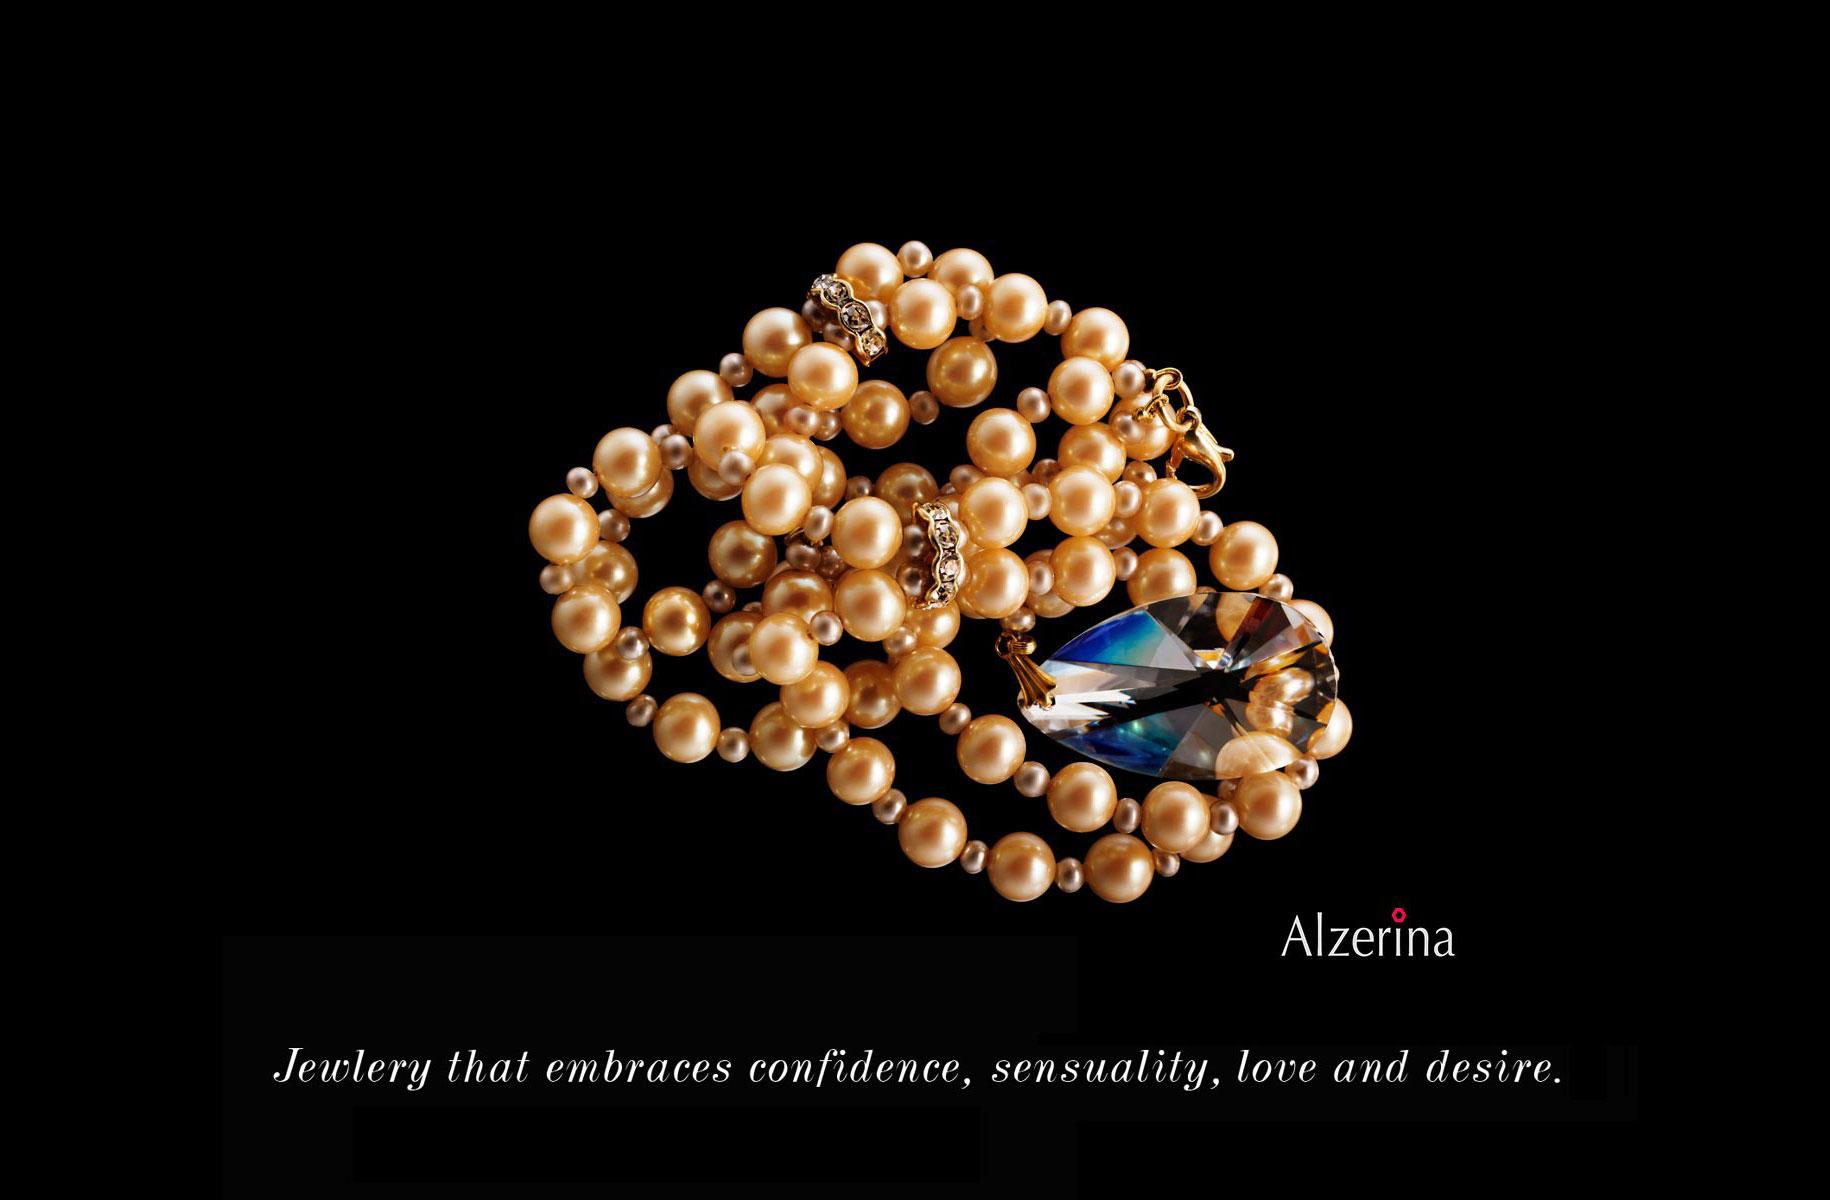 101202_85b_Alzerina_Pearl-149673_e.jpg